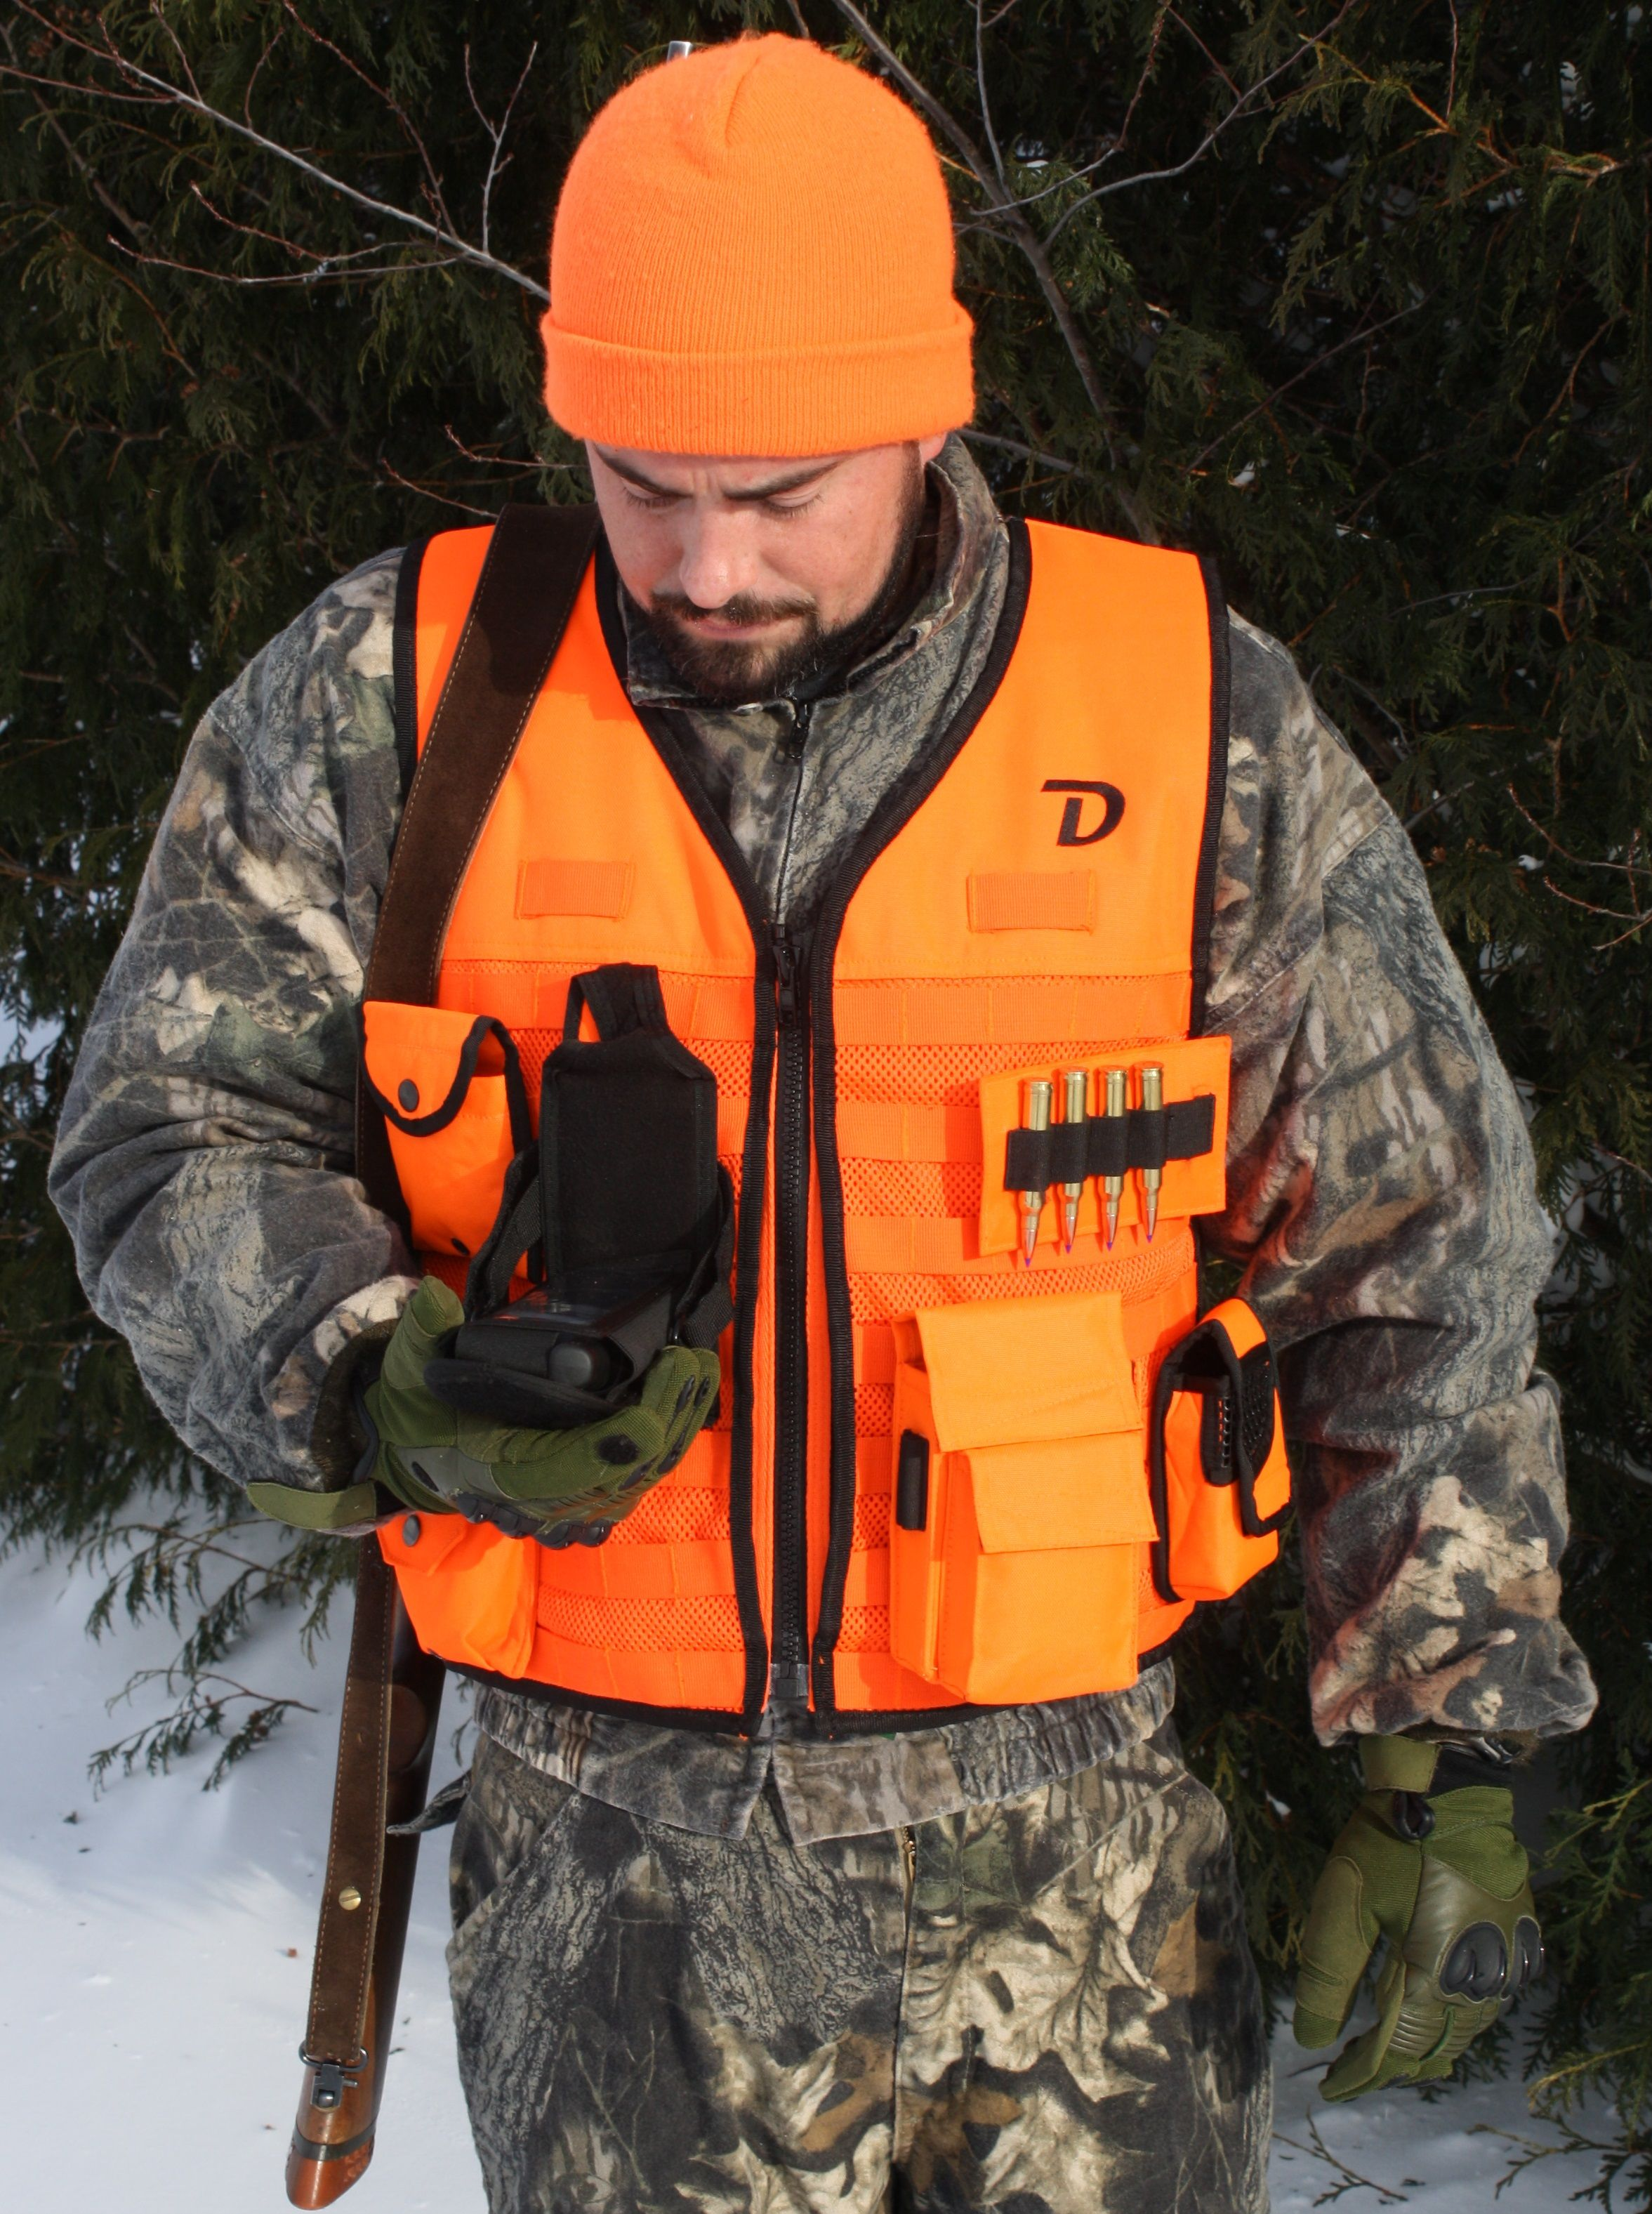 5374afafd9c68 Blaze Orange MOLLE Vest www.dutyapparel.com | Hunting Apparel ...